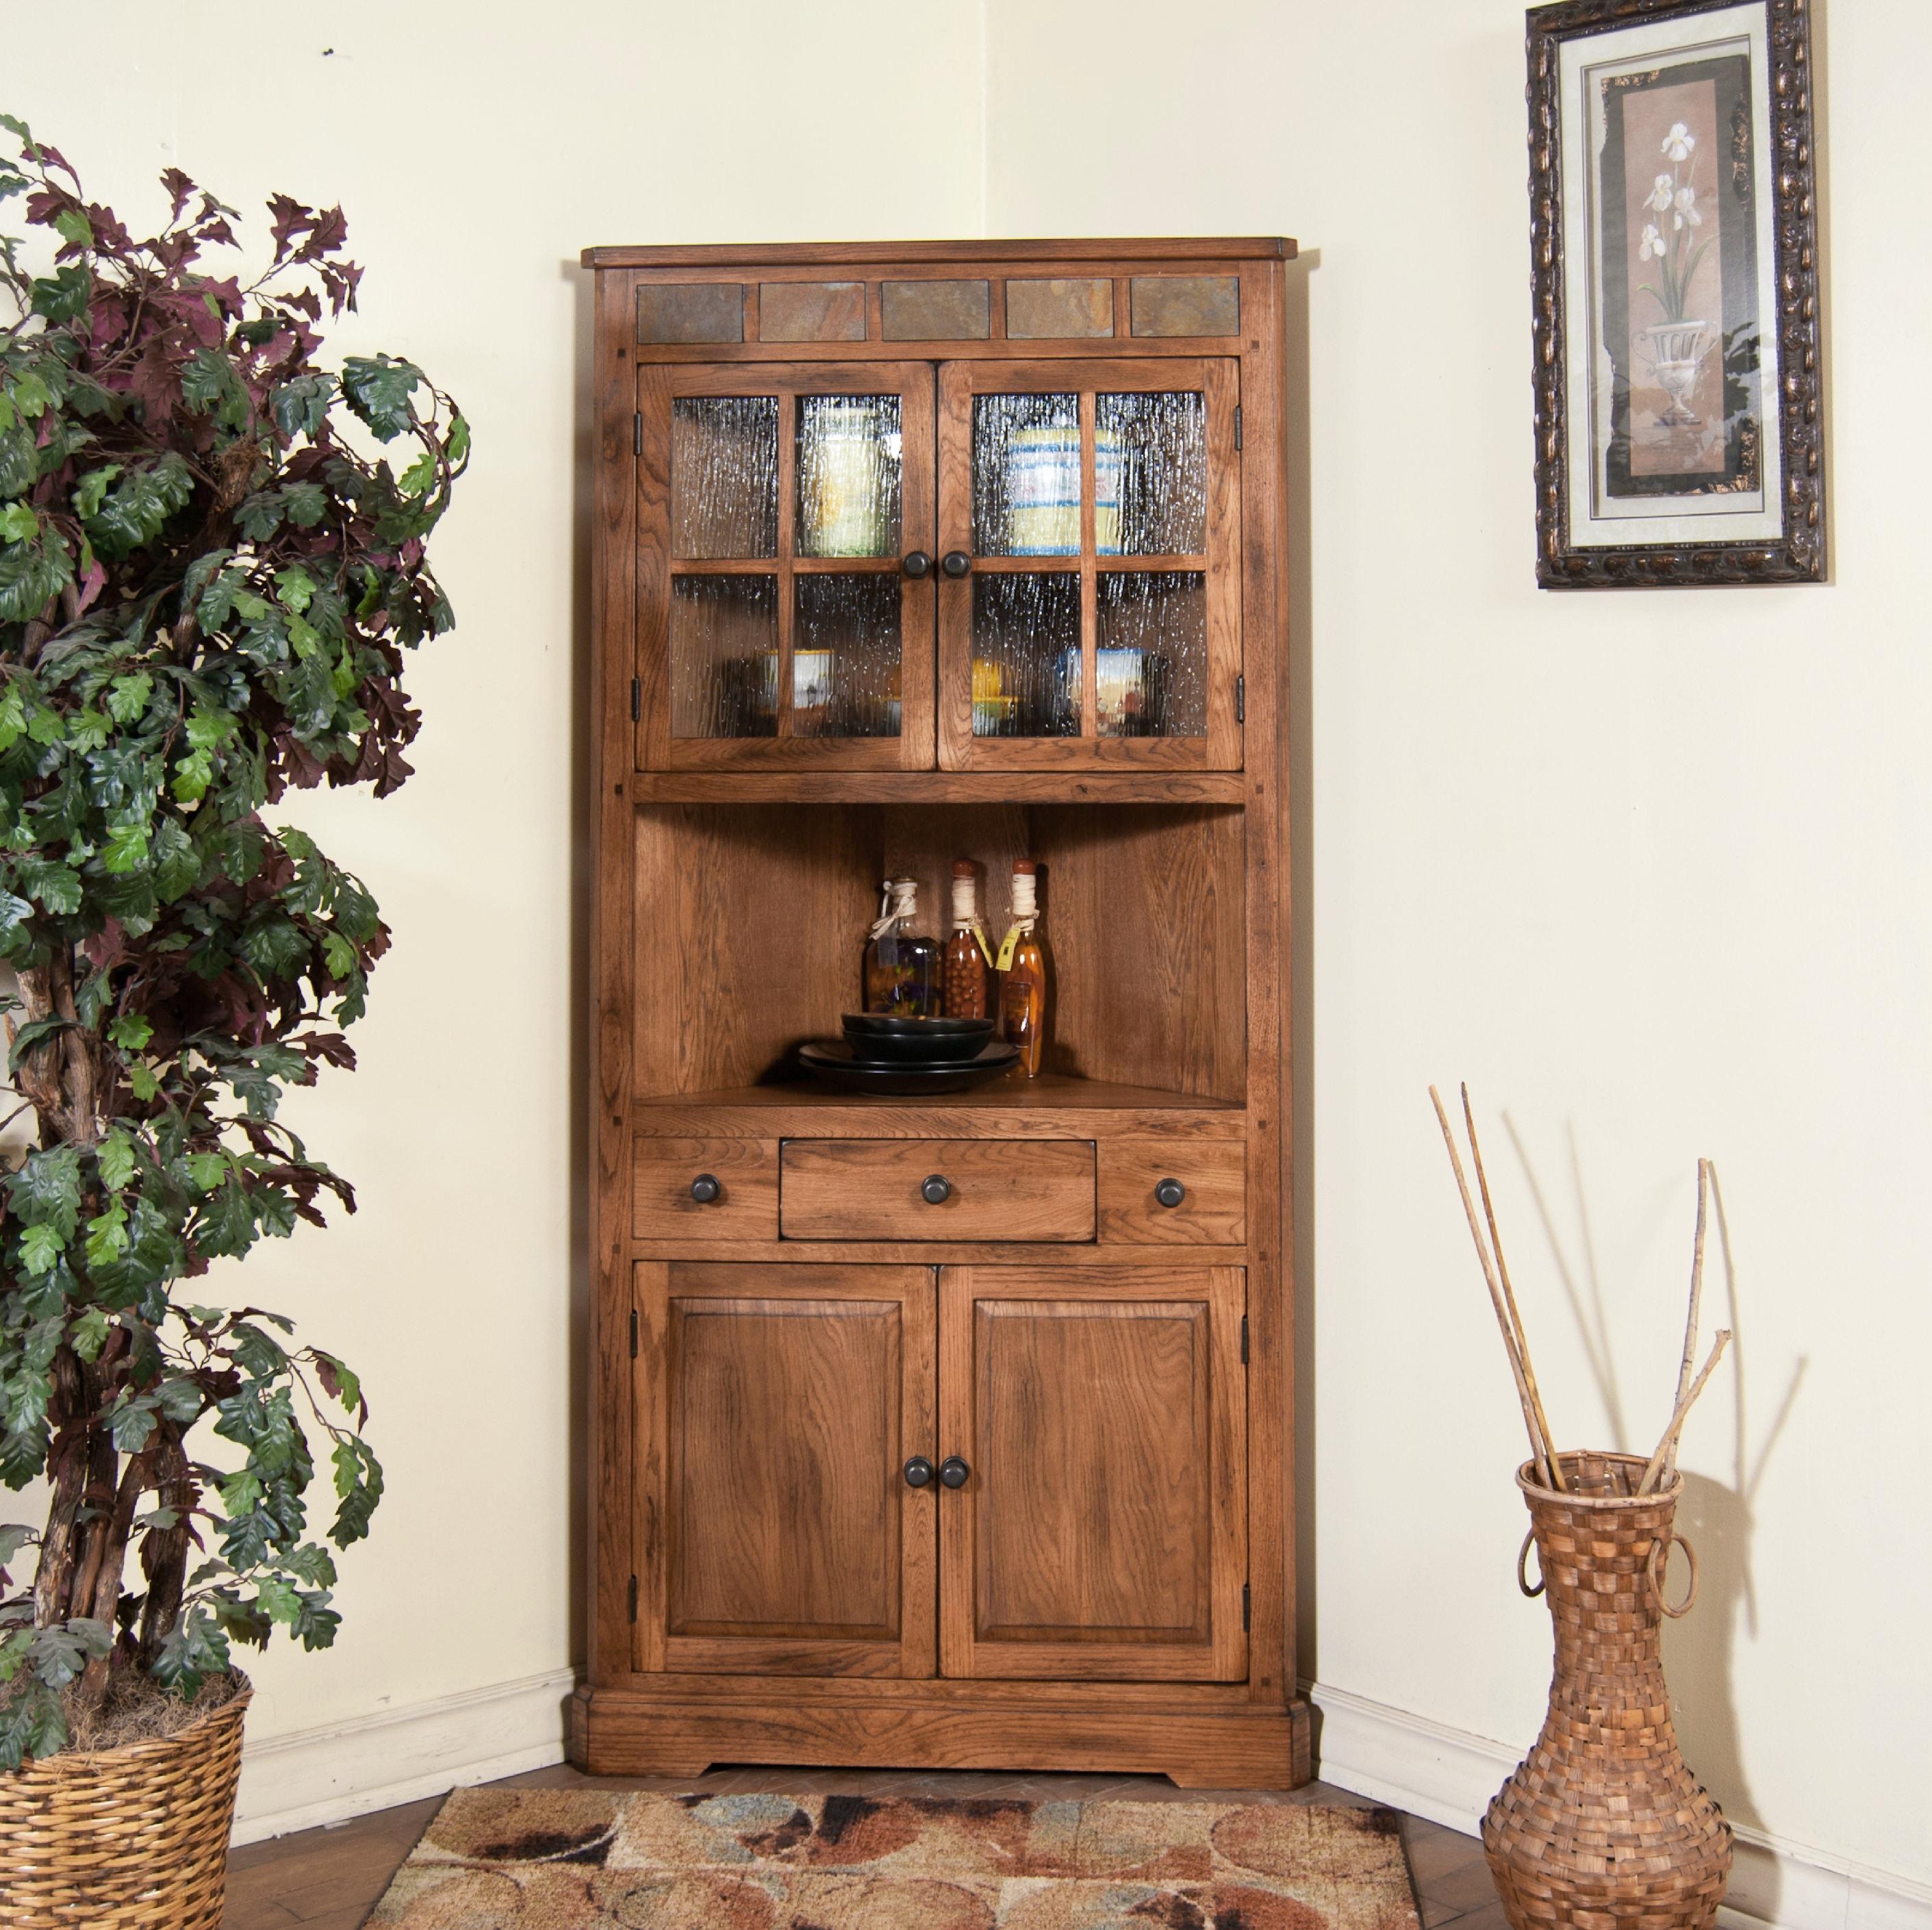 Sunny Designs Sedona Corner China Cabinet 2451RO